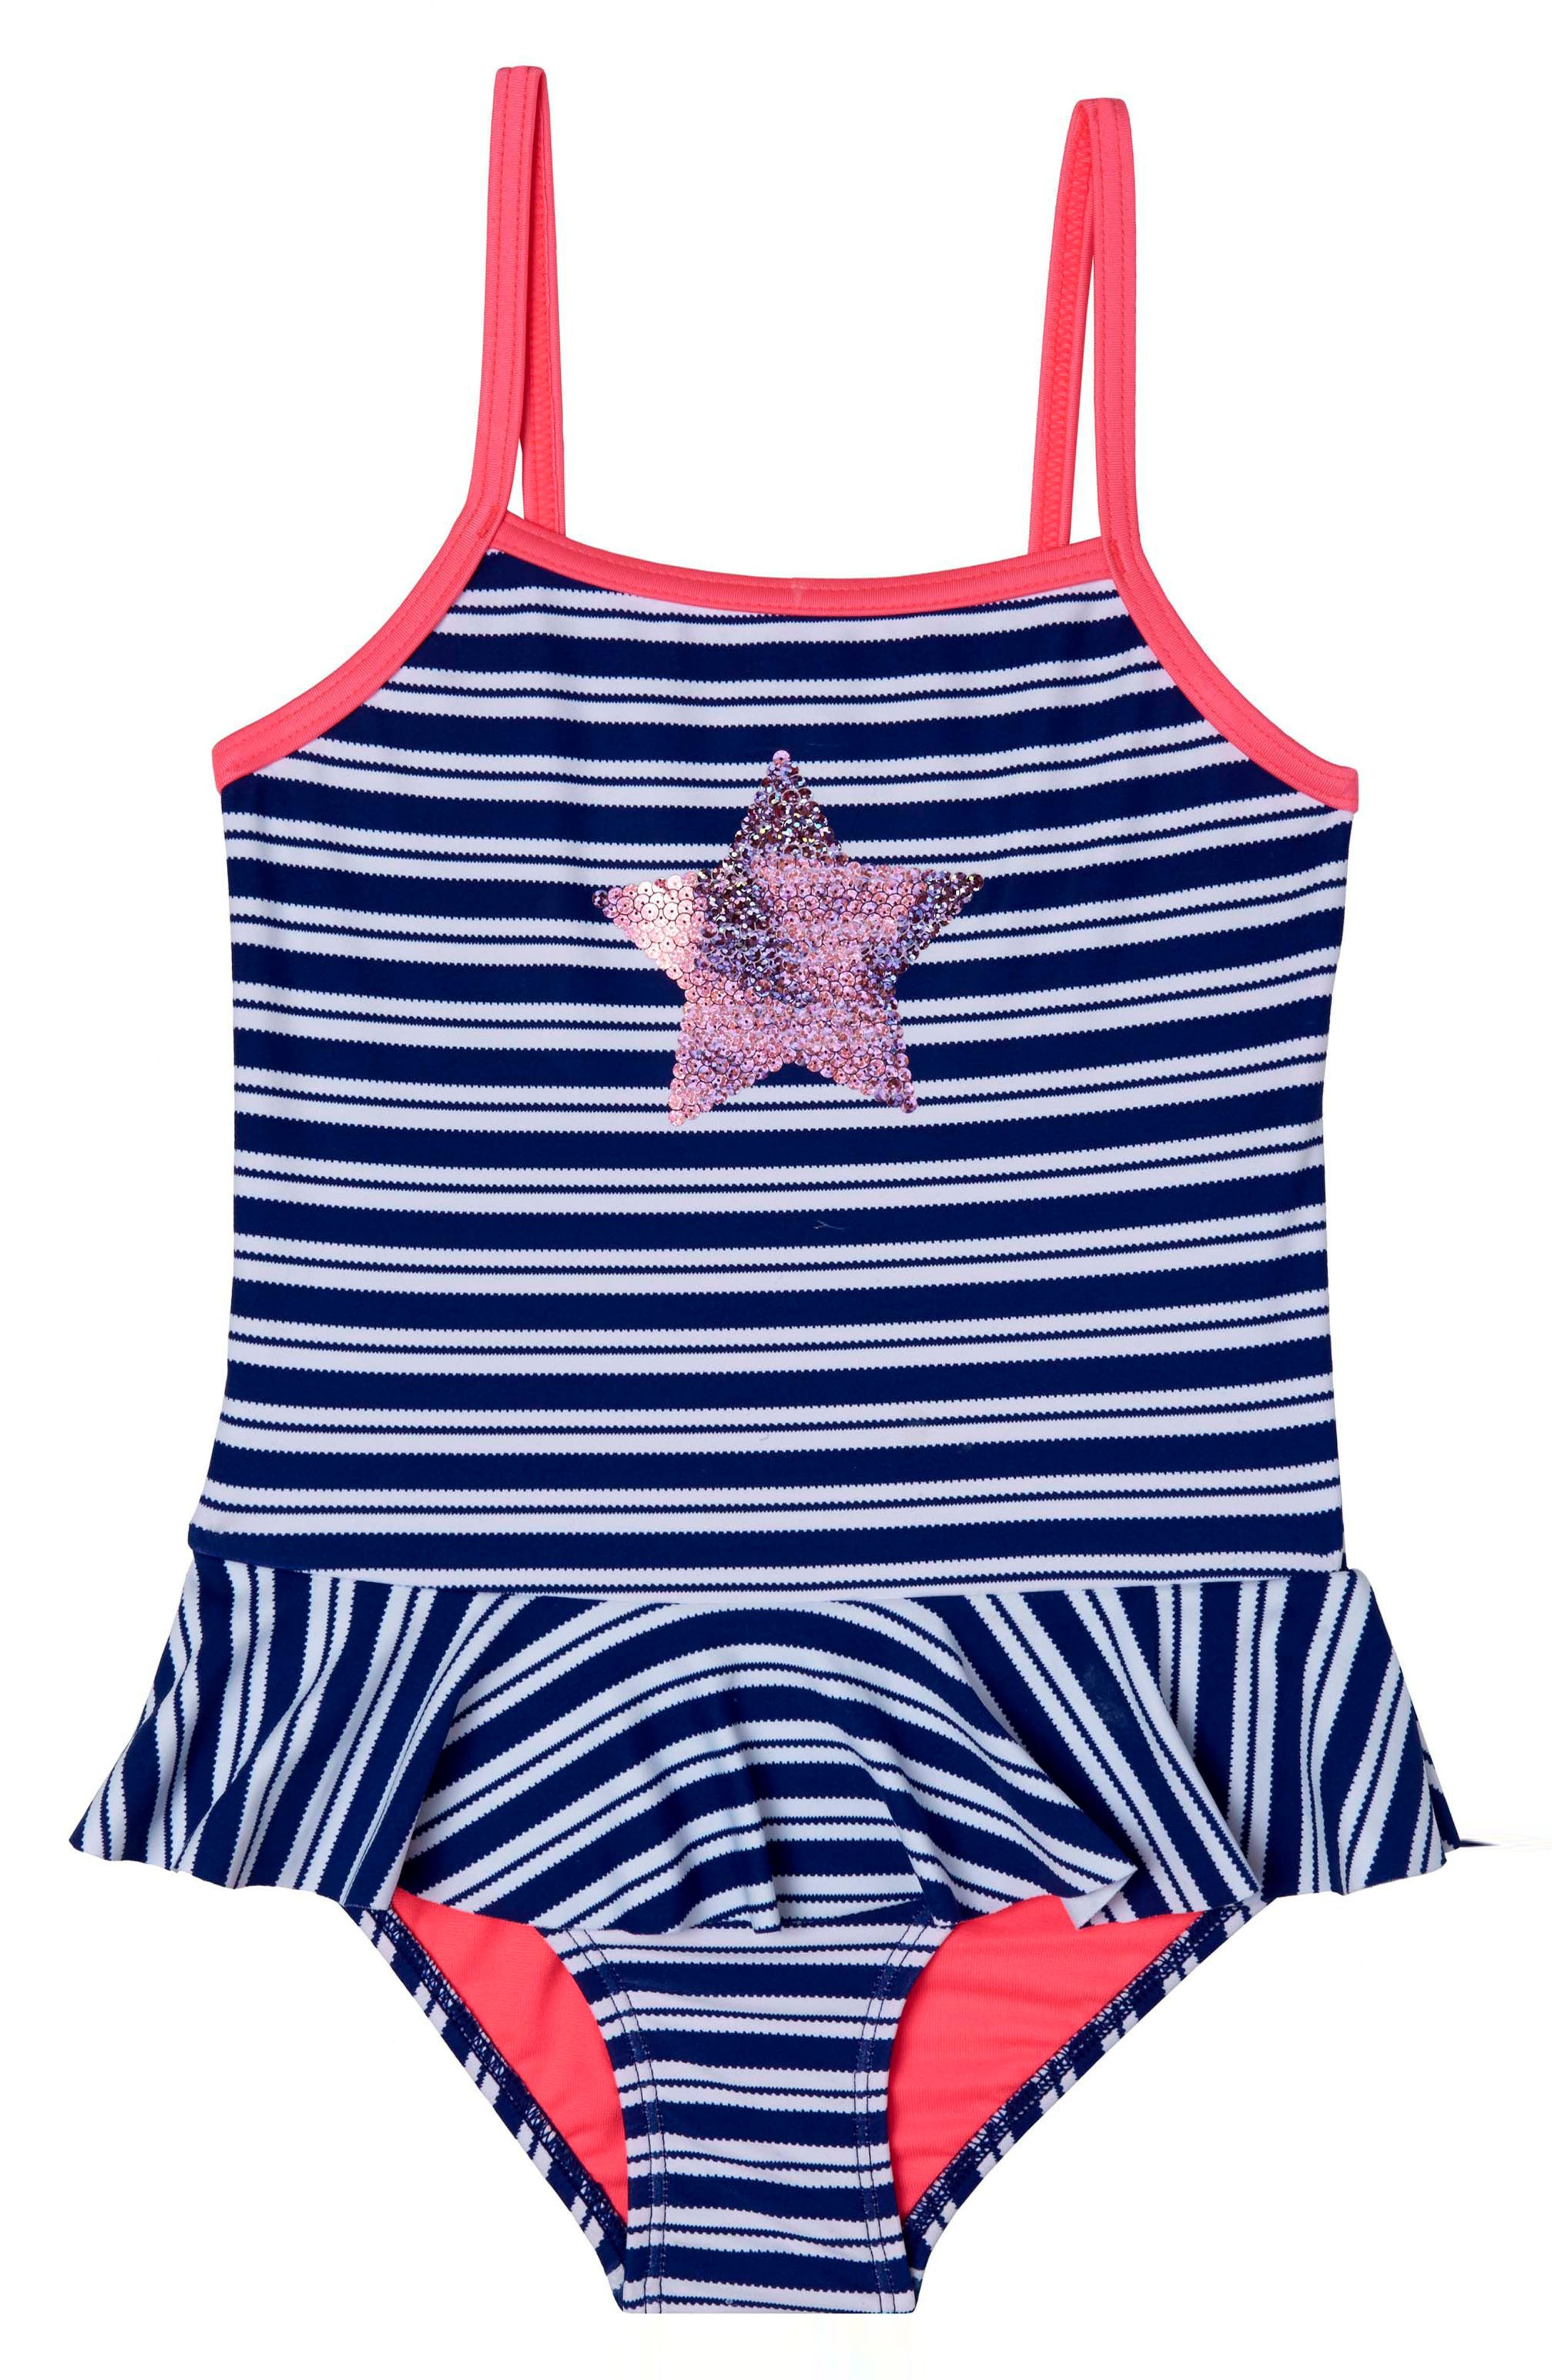 Main Image - Hula Star Retro Stripe One-Piece Swimsuit (Toddler Girls & Little Girls)